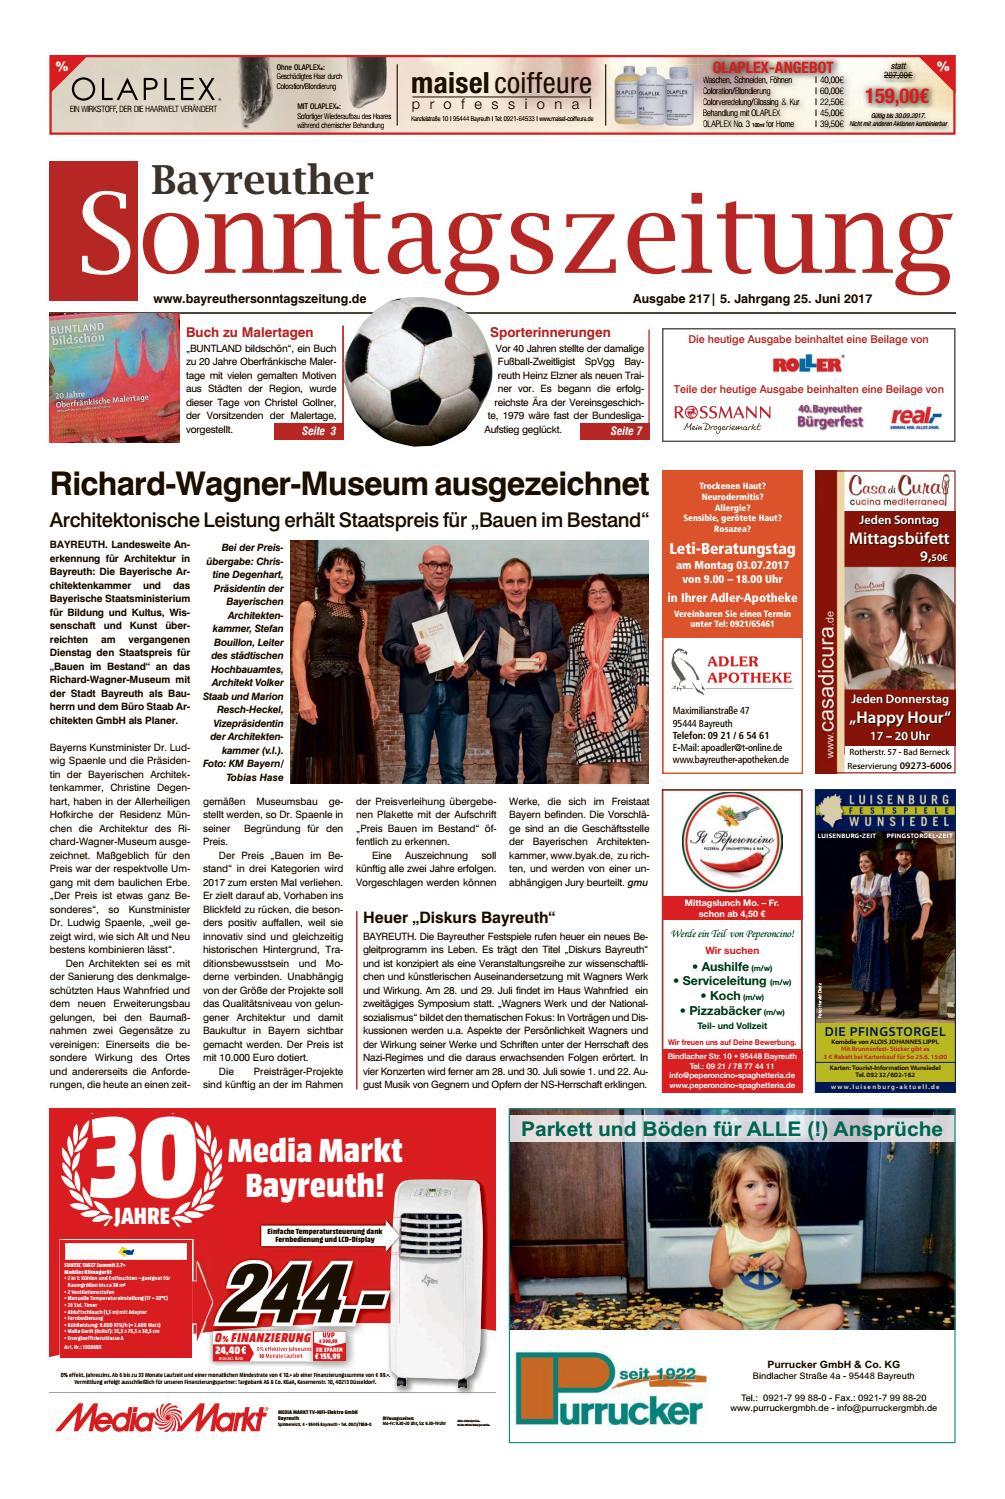 Maler Bayreuth bayreuther sonntagszeitung vom 25 06 2017 by bayreuther